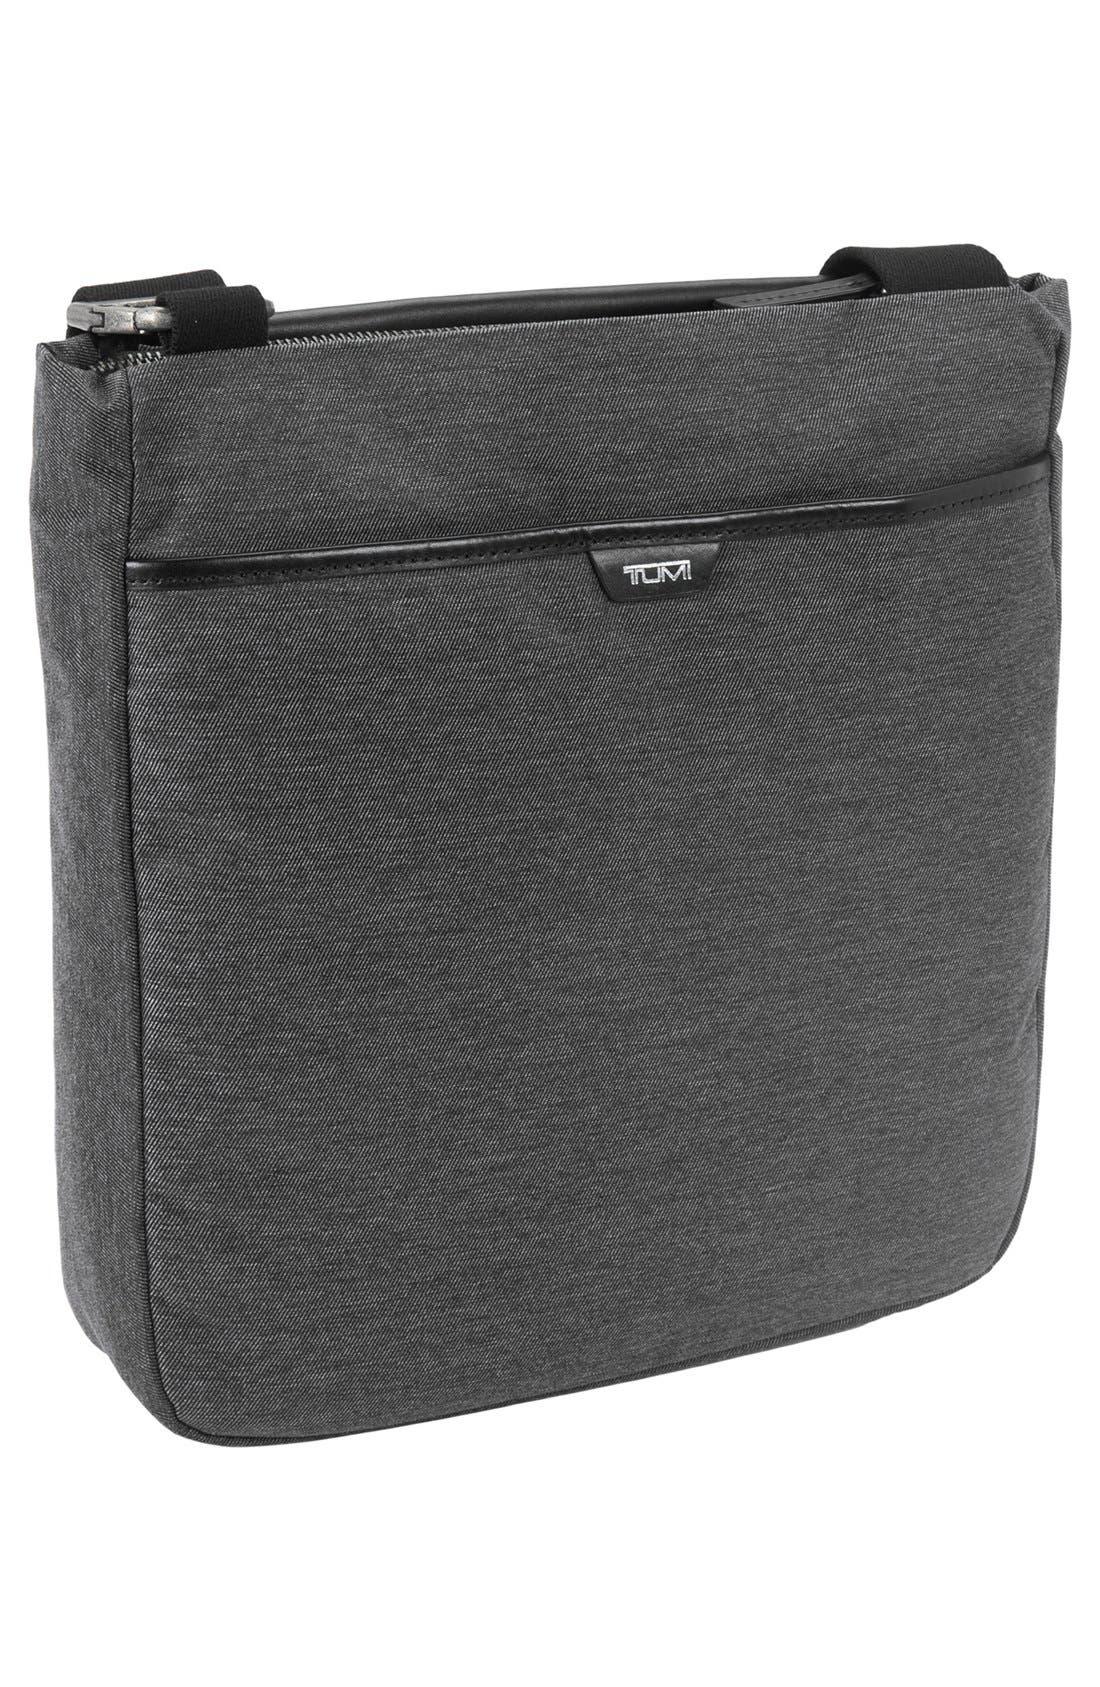 Alternate Image 3  - T-Tech by Tumi 'Forge - Pueblo' Top Zip Flap Bag